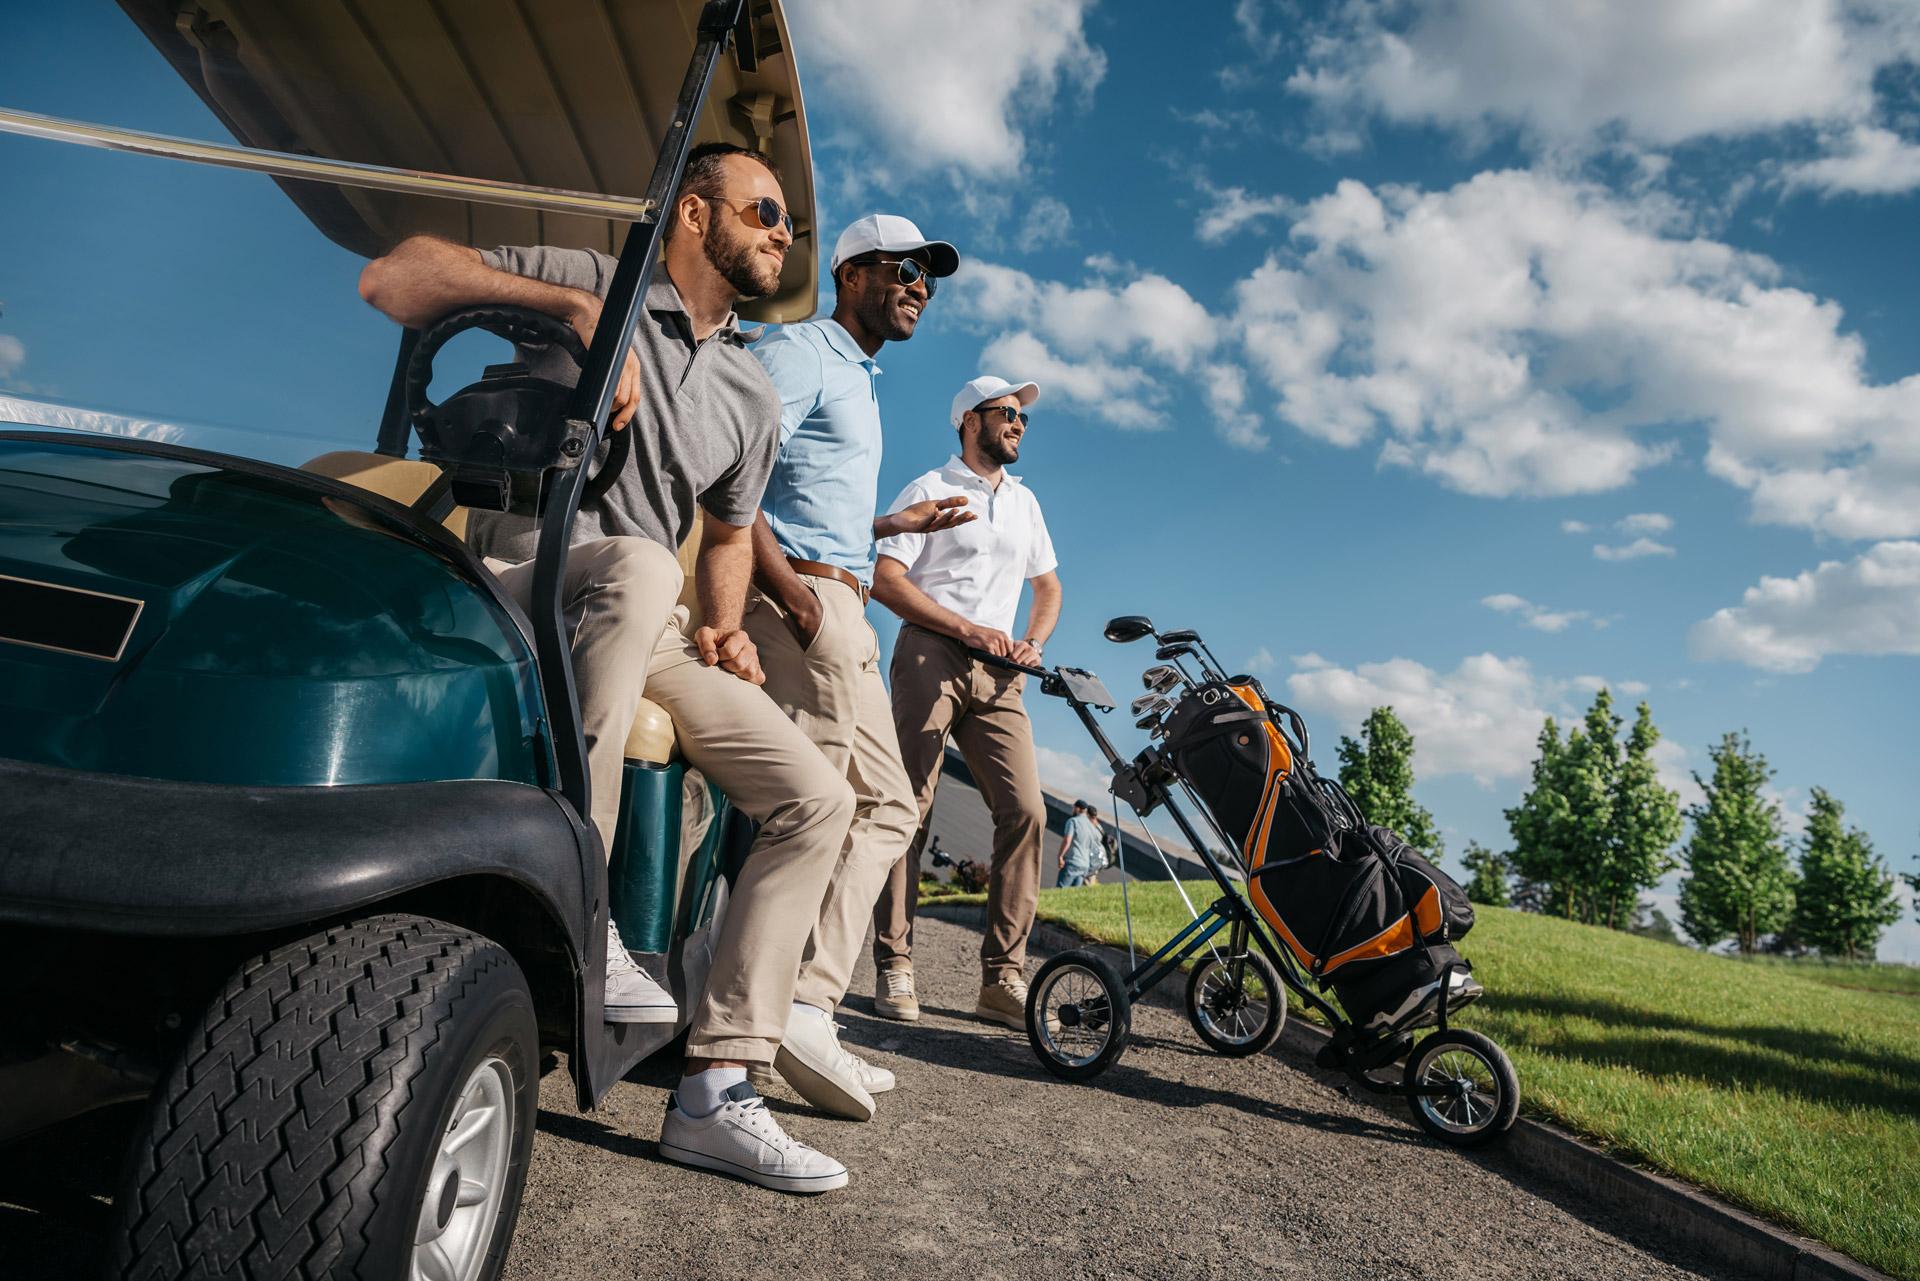 group-of-smiling-friends-standing-near-golf-cart-a-5V97KE9